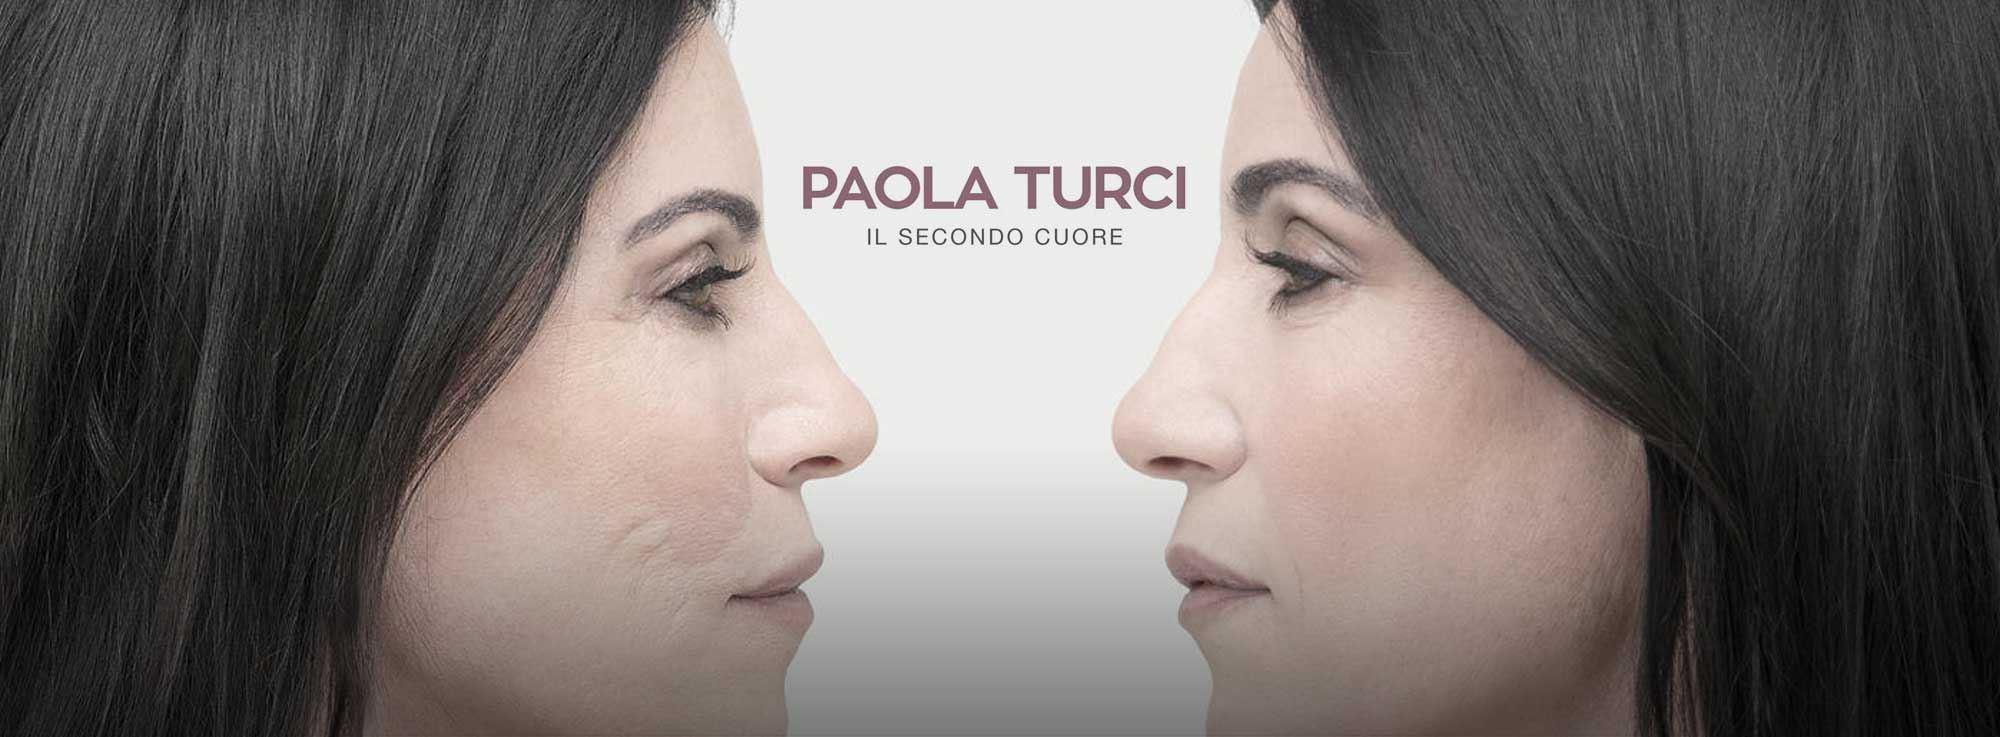 Taranto: Paola Turci - Secondo cuore tour